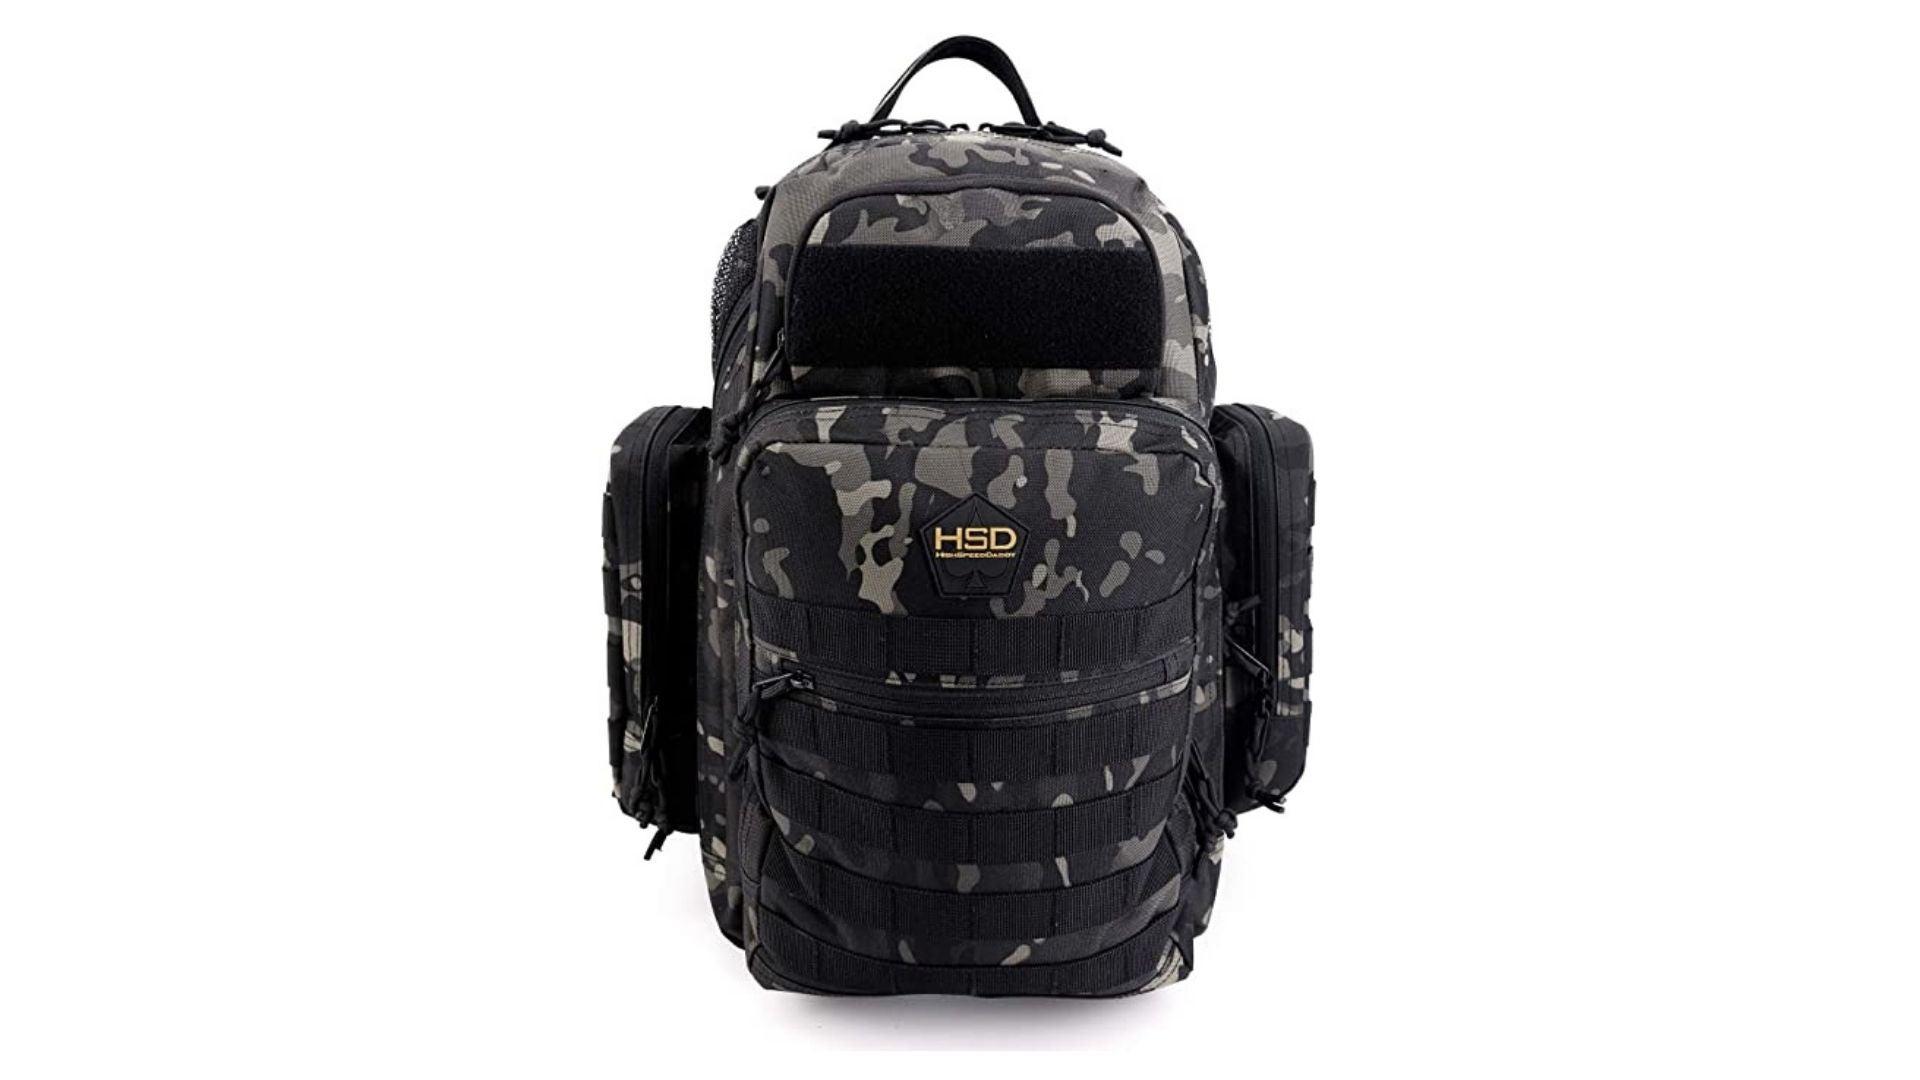 HighSpeedDaddy Diaper Bag Backpack